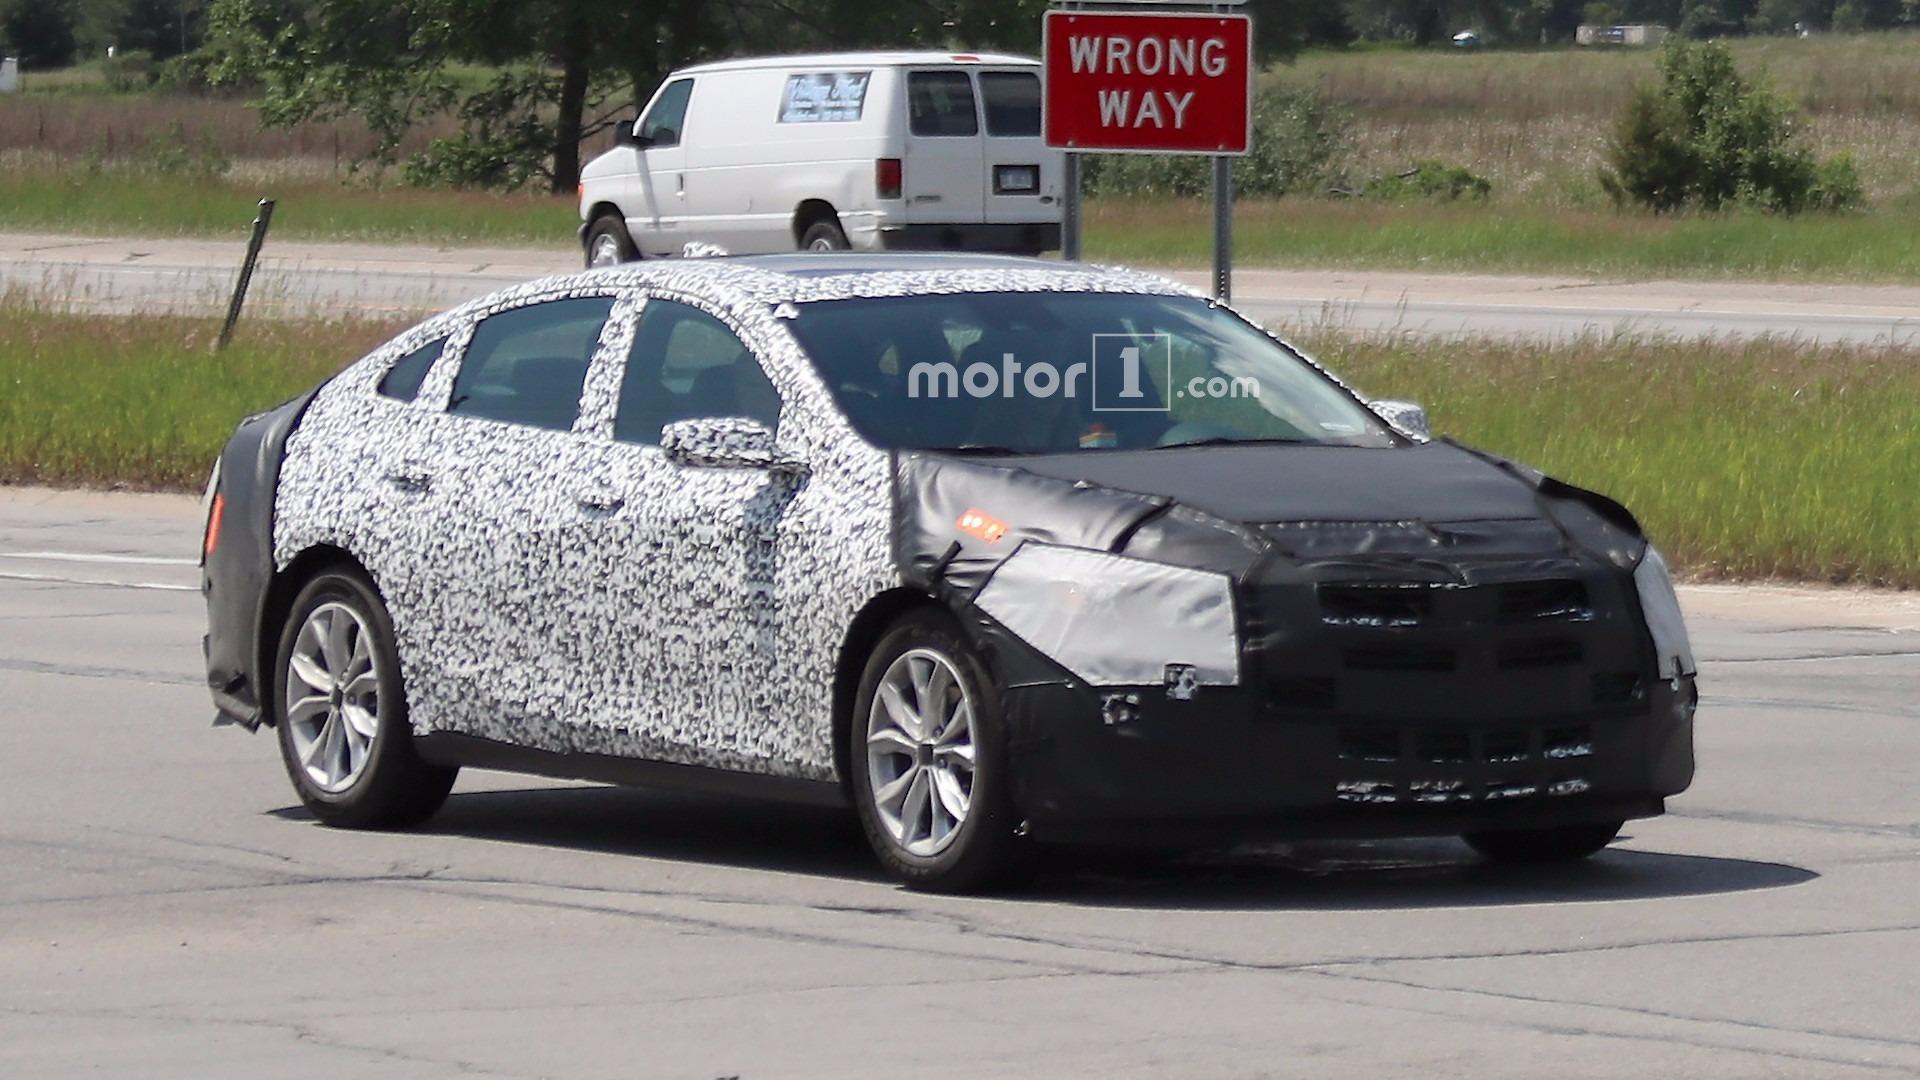 2019 Malibu >> 2019 Chevy Malibu Prototype Caught Hiding In Plain Sight